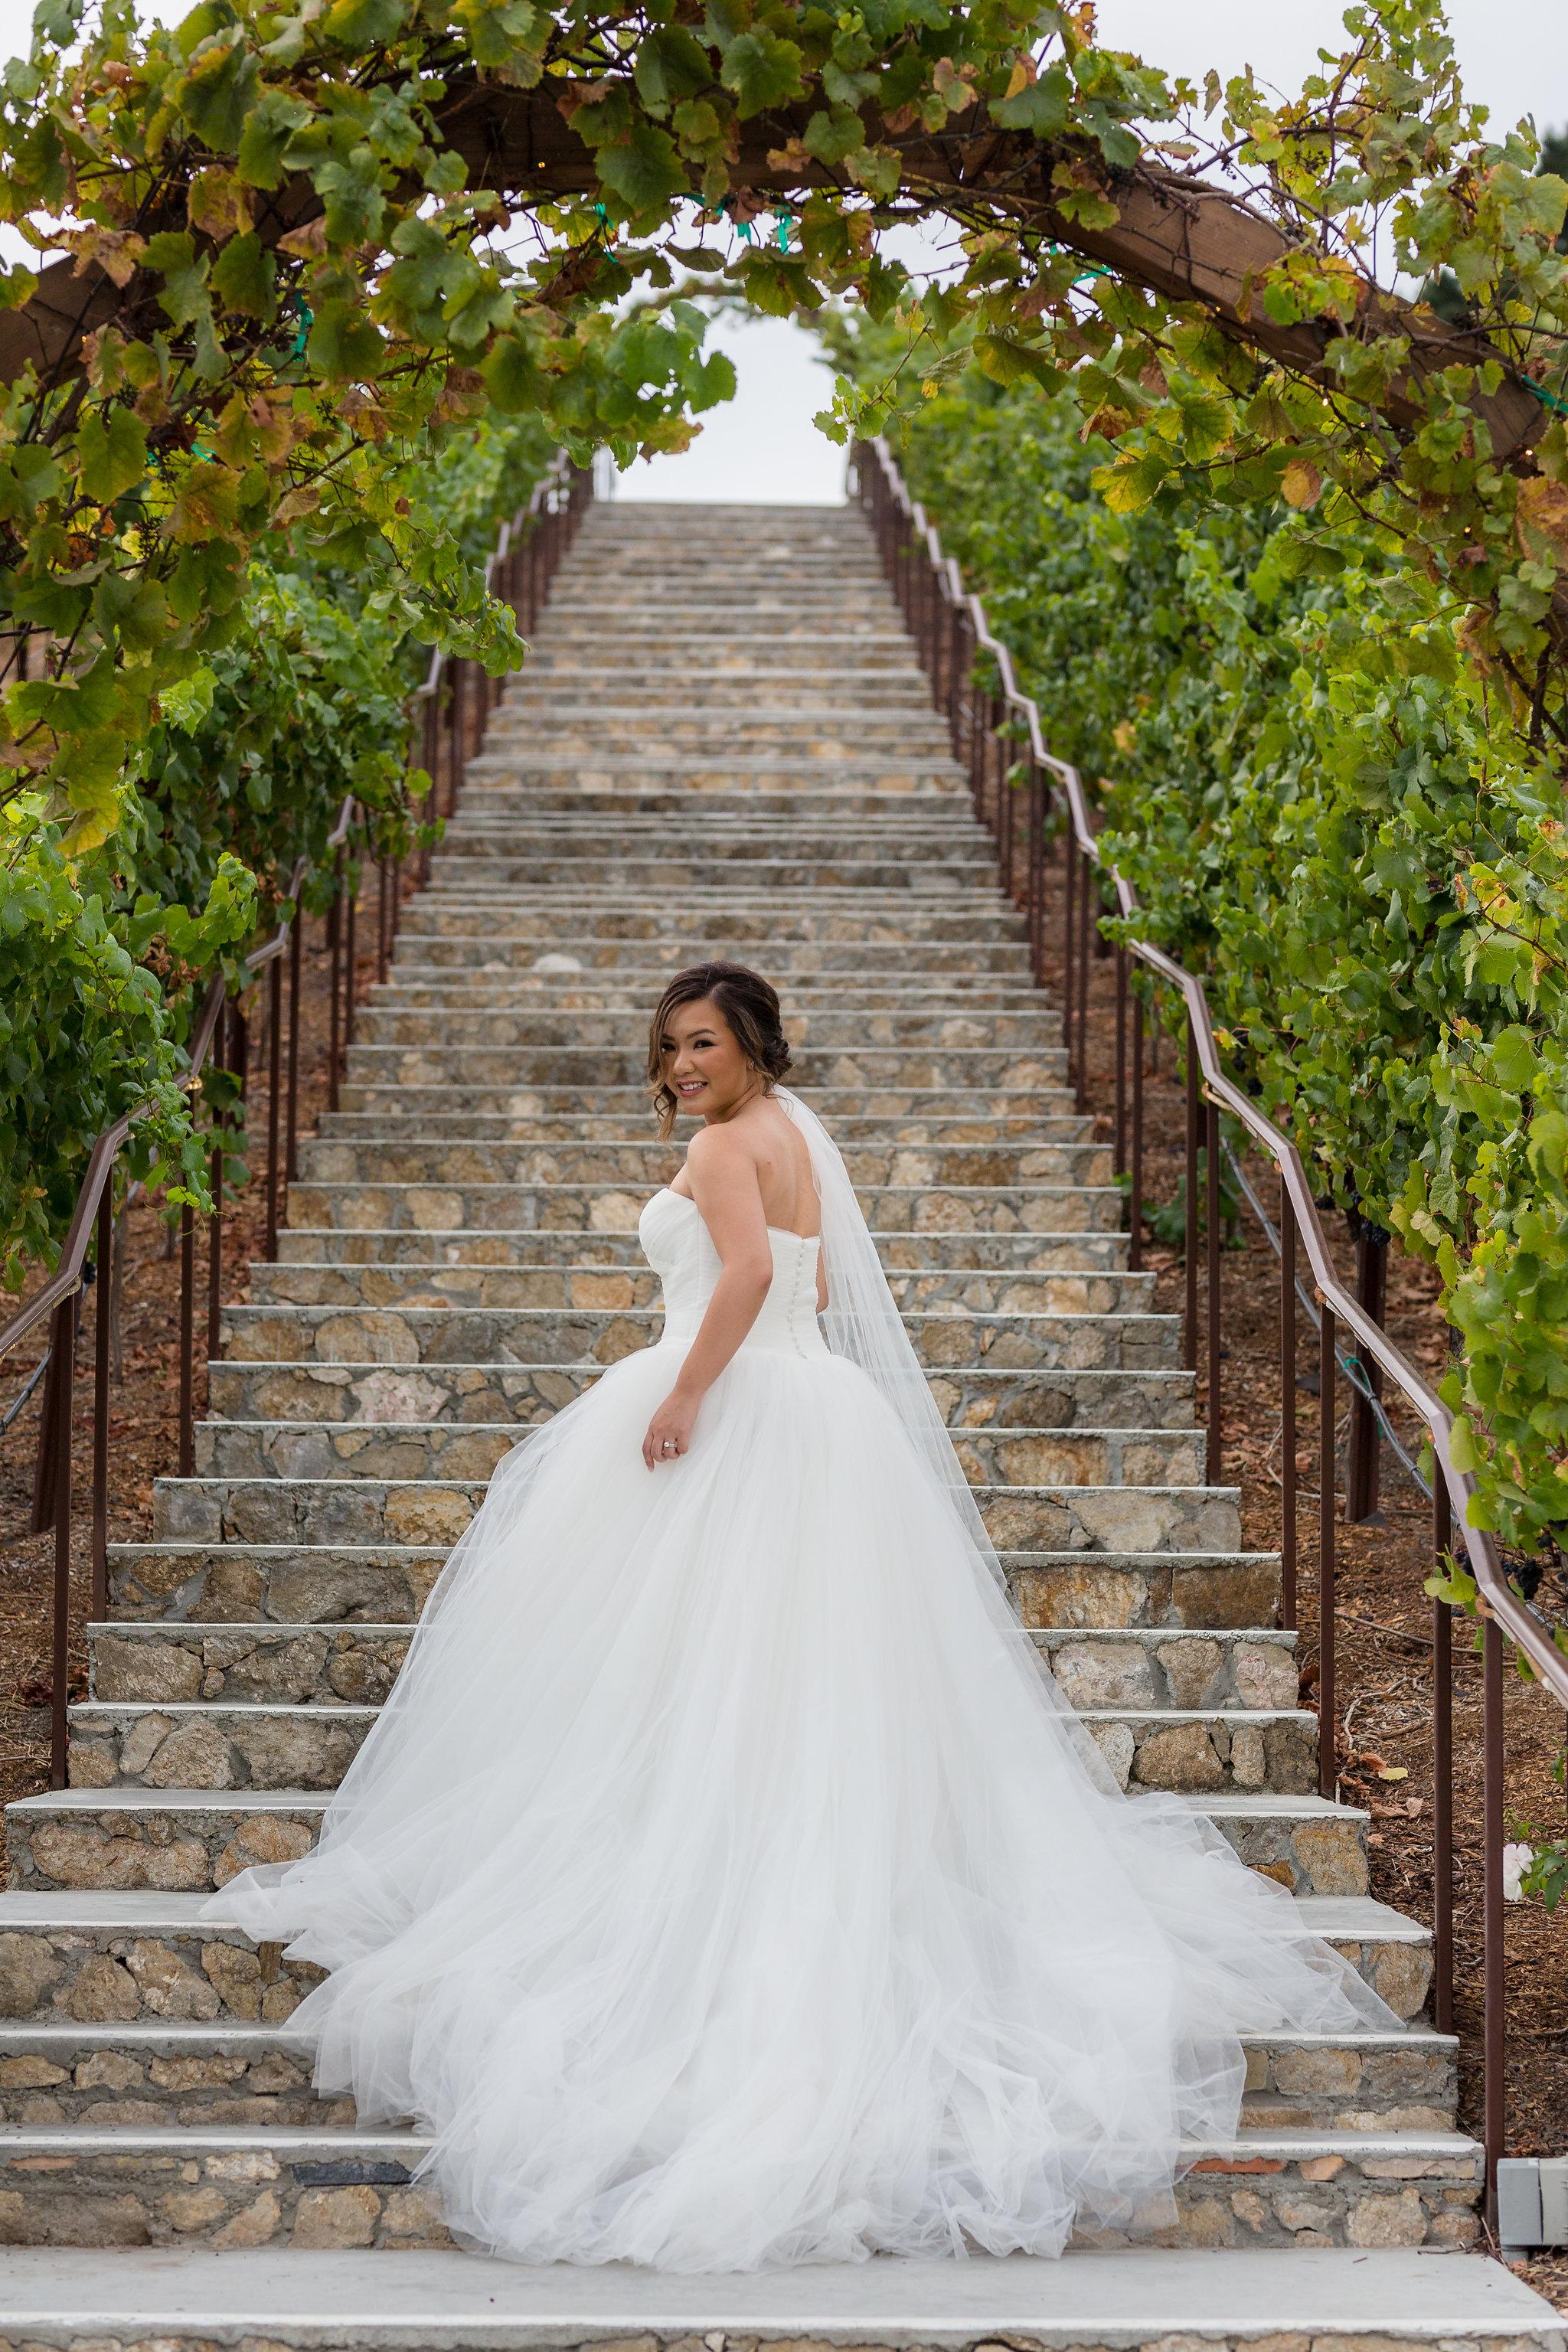 Nella Terra Sunol wedding photography-14.jpg